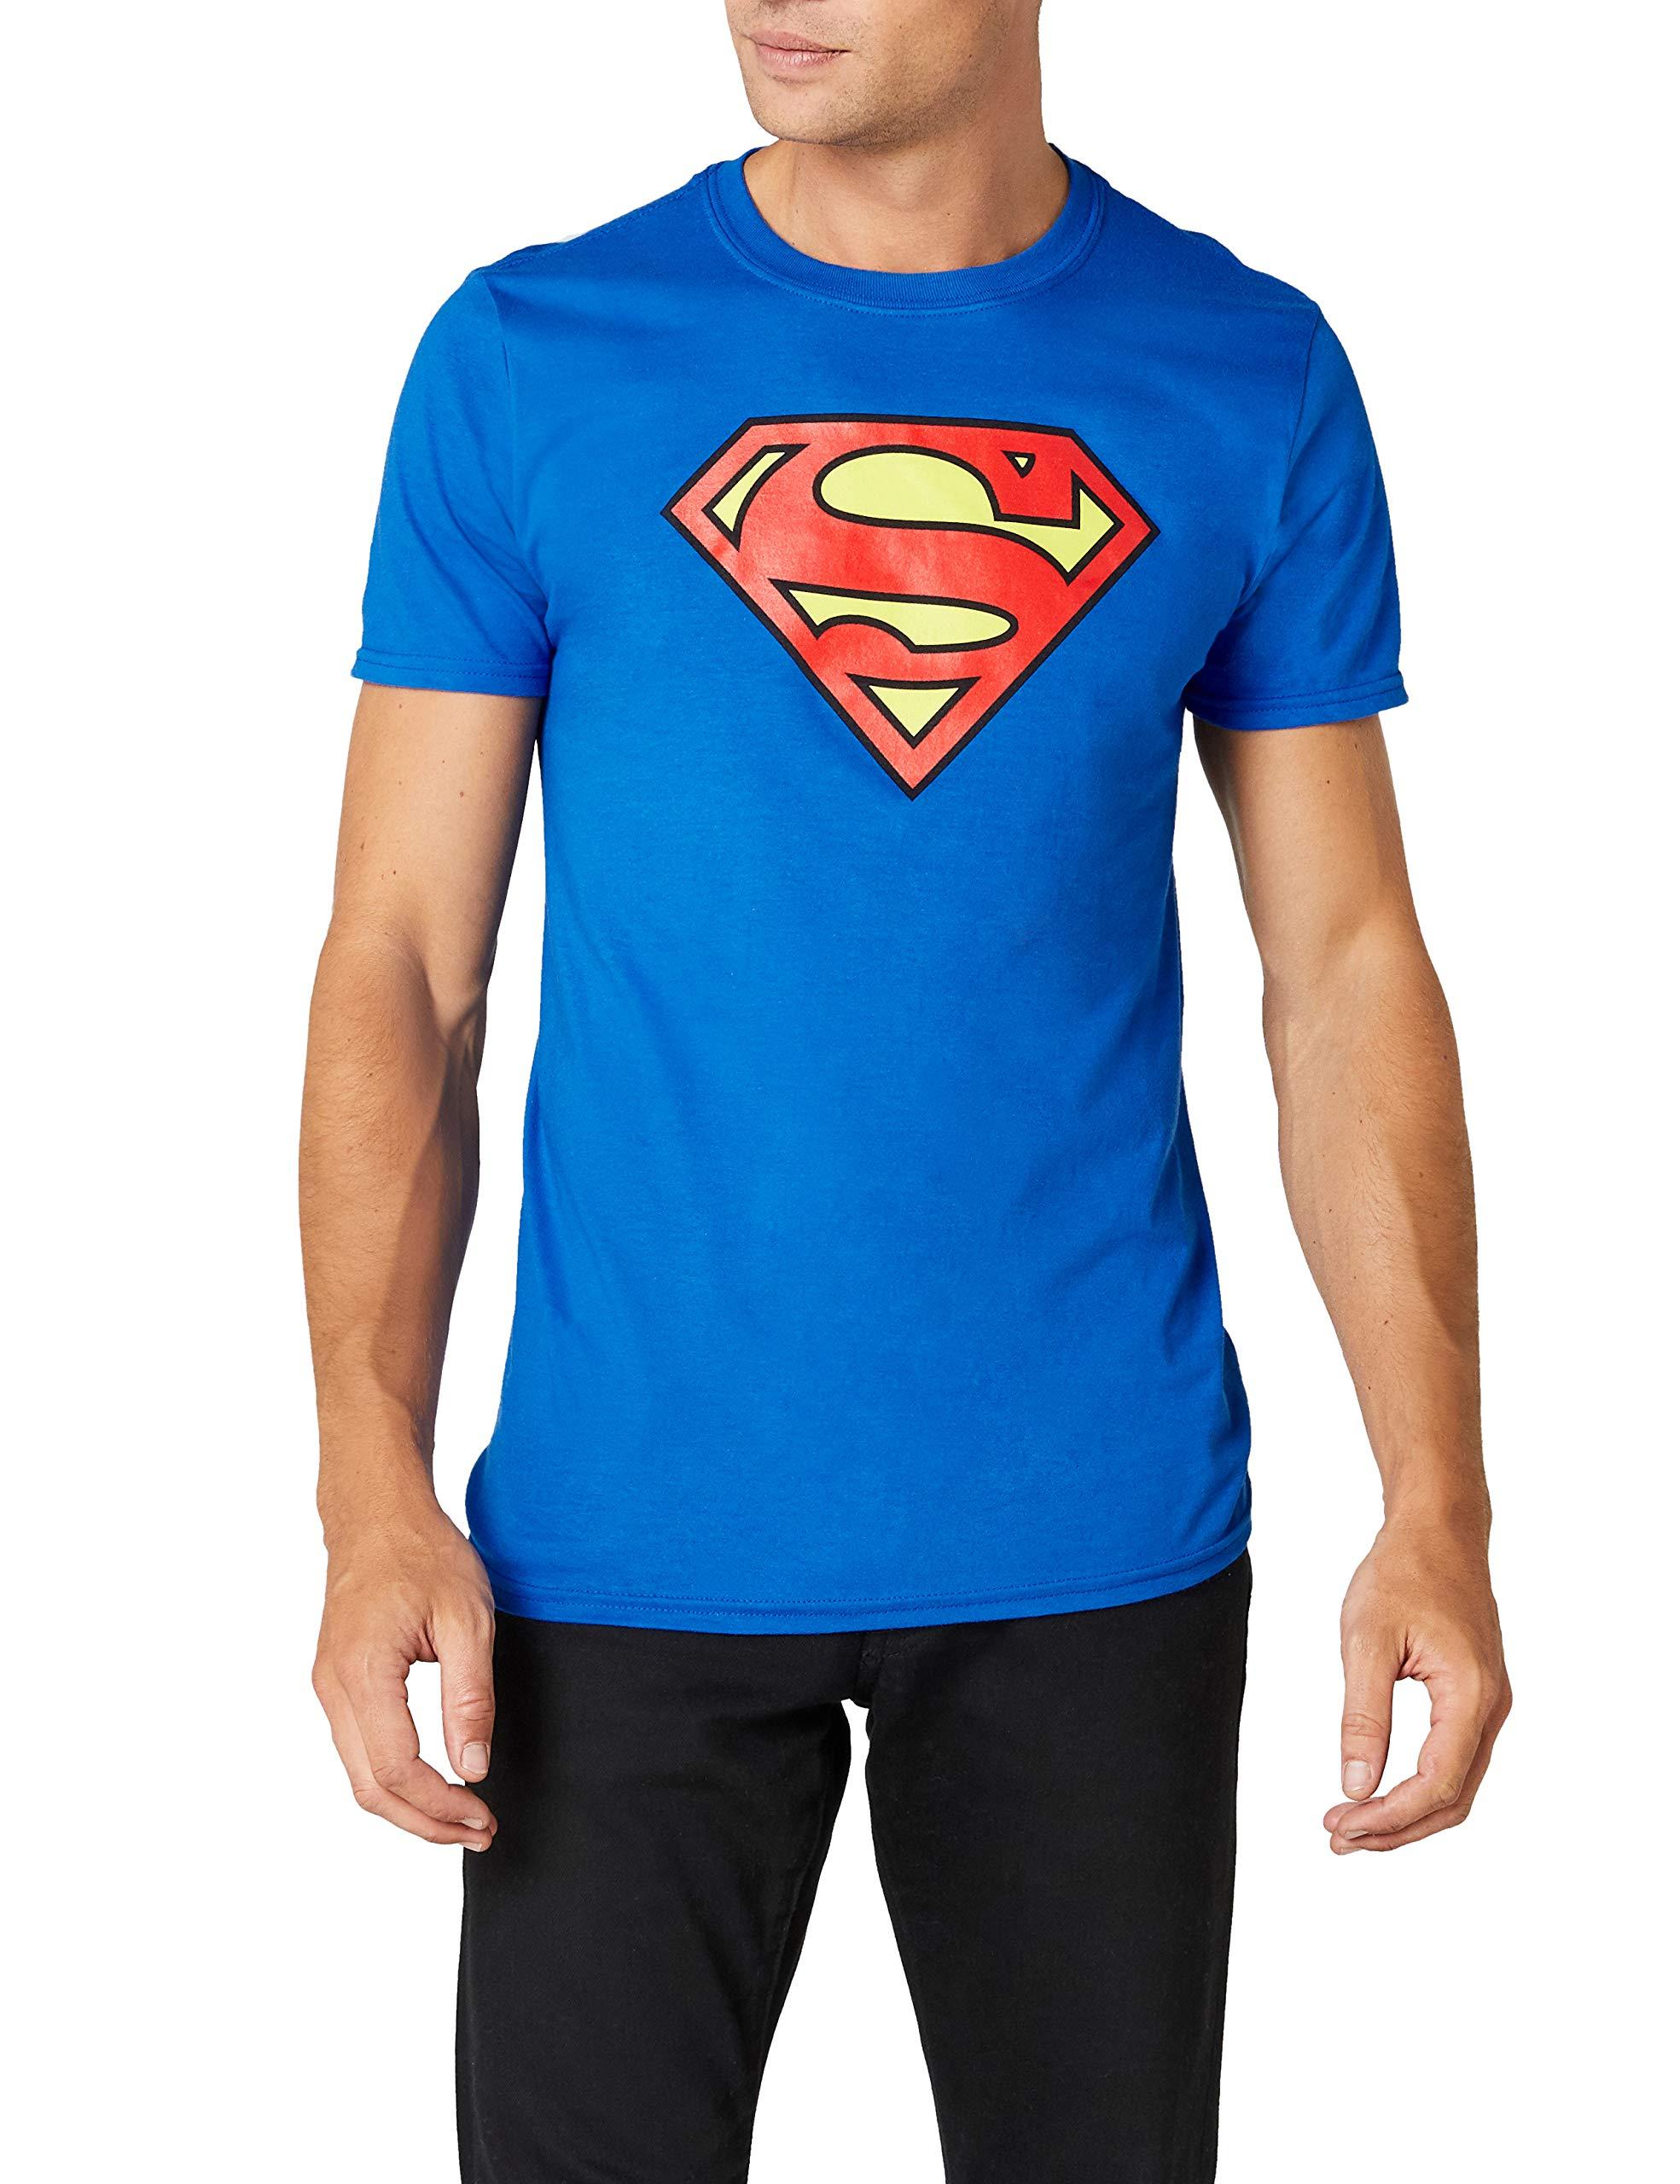 Collectors Mine Camiseta para Hombre product image